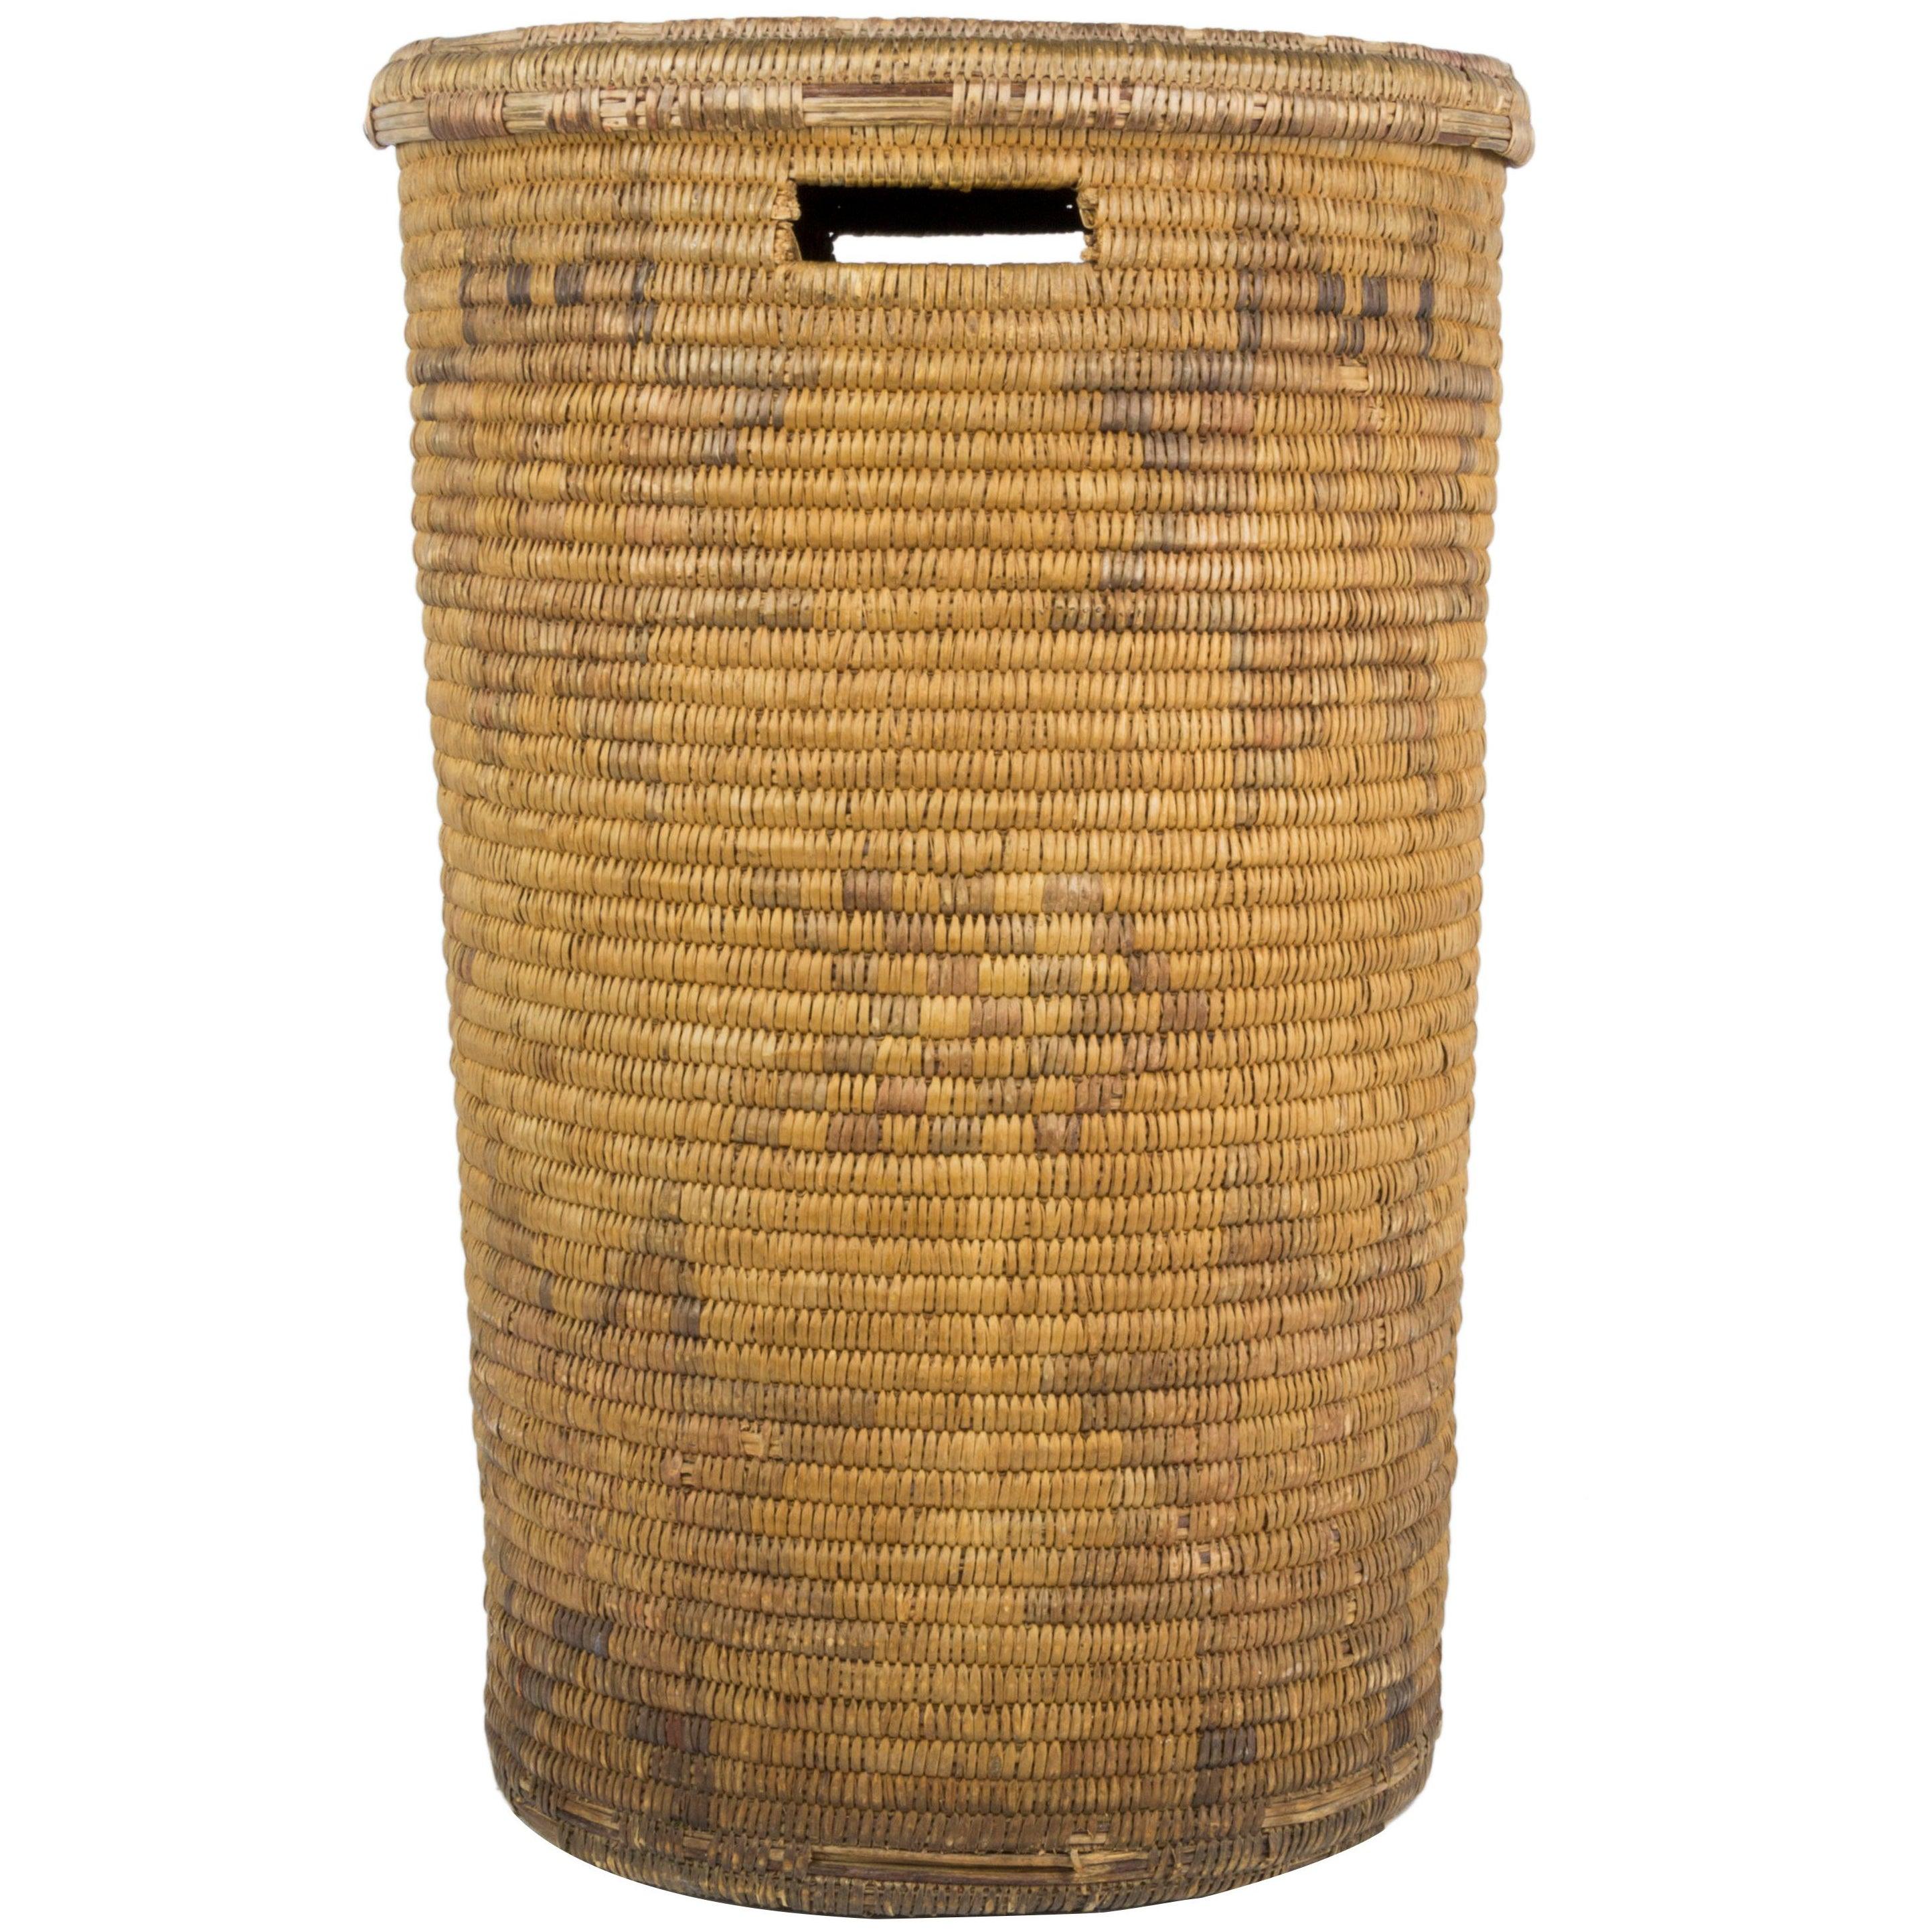 Jicarilla Lidded Storage Basket